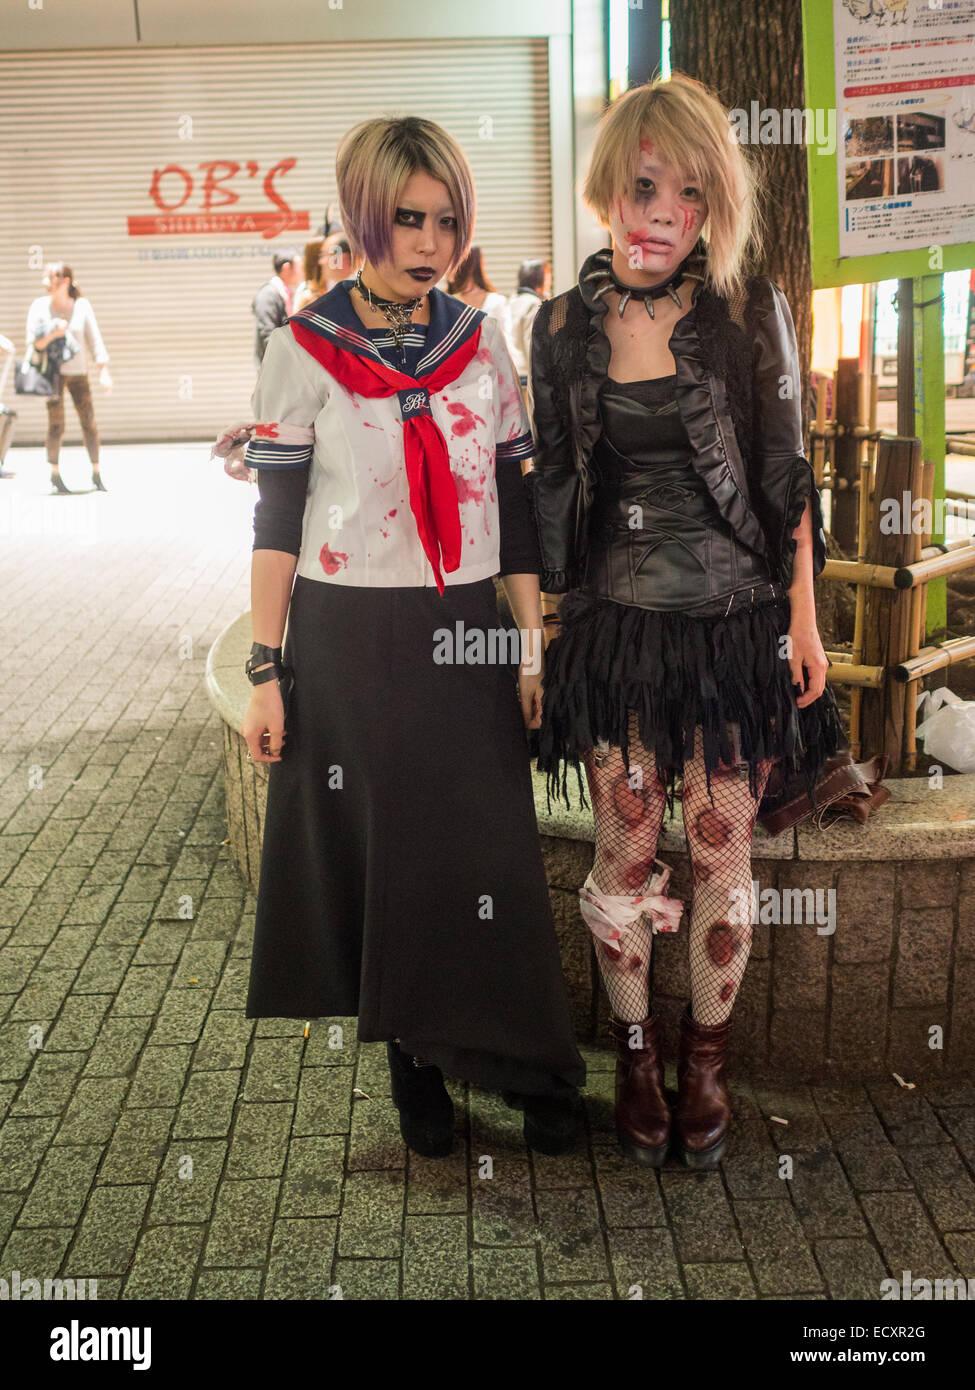 two girls in halloween costumes in shibuya